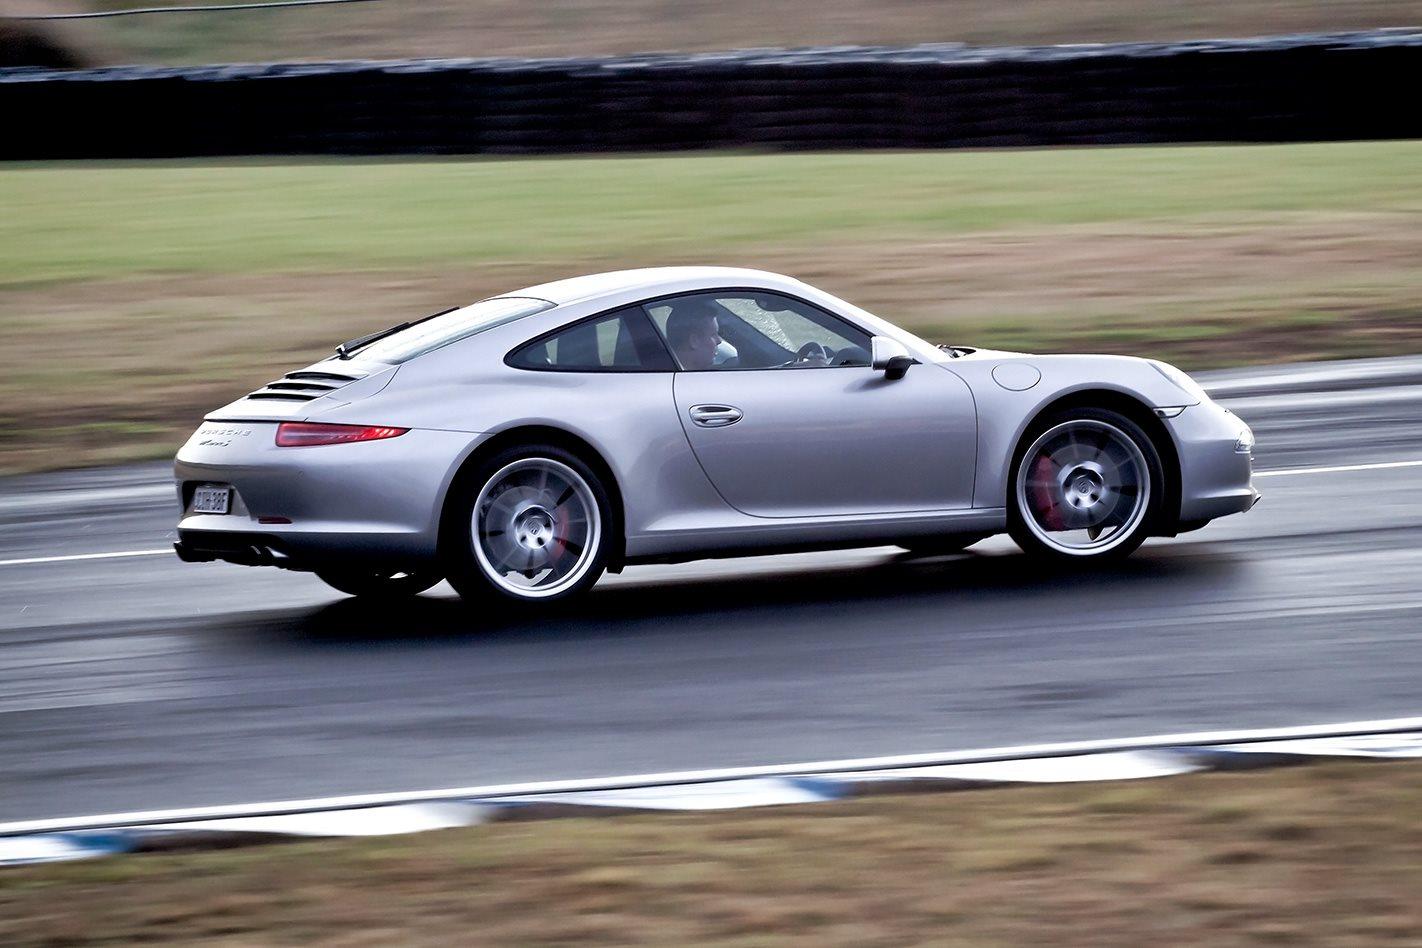 2012-Porsche-911-Carrera-S-side.jpg